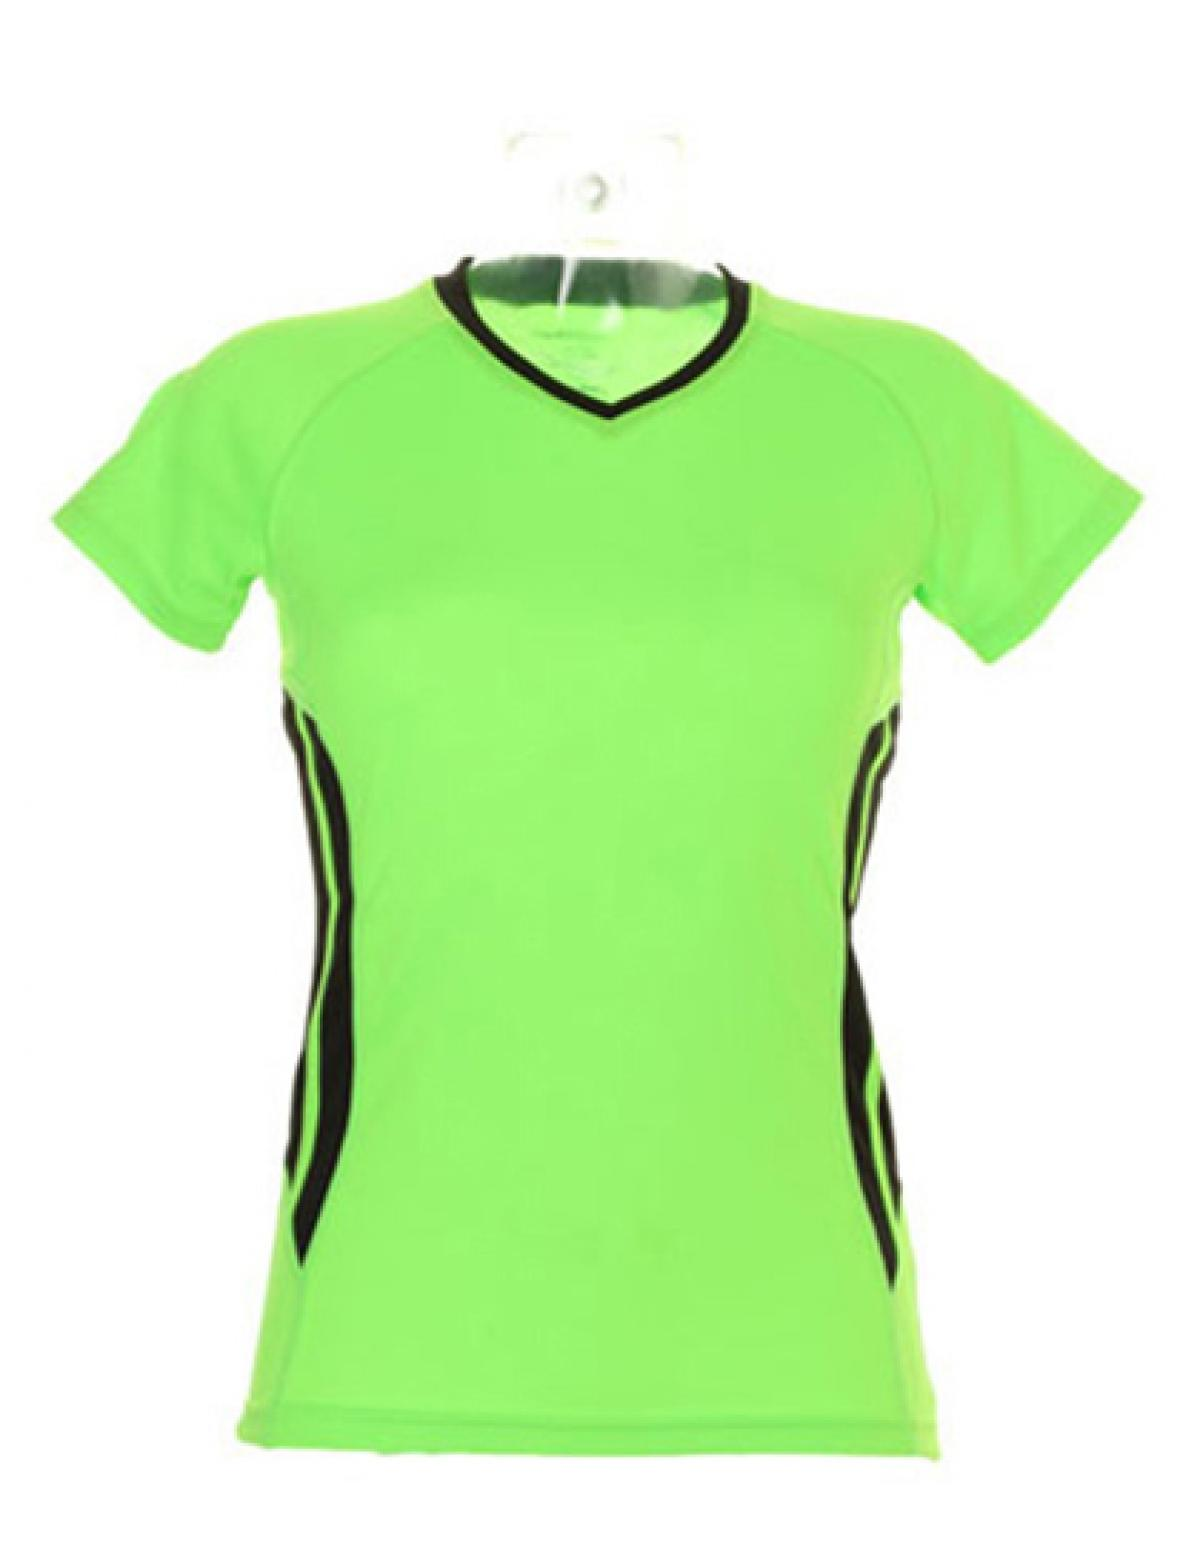 Damen sport training t shirt atmungsaktives material for Thick material t shirts